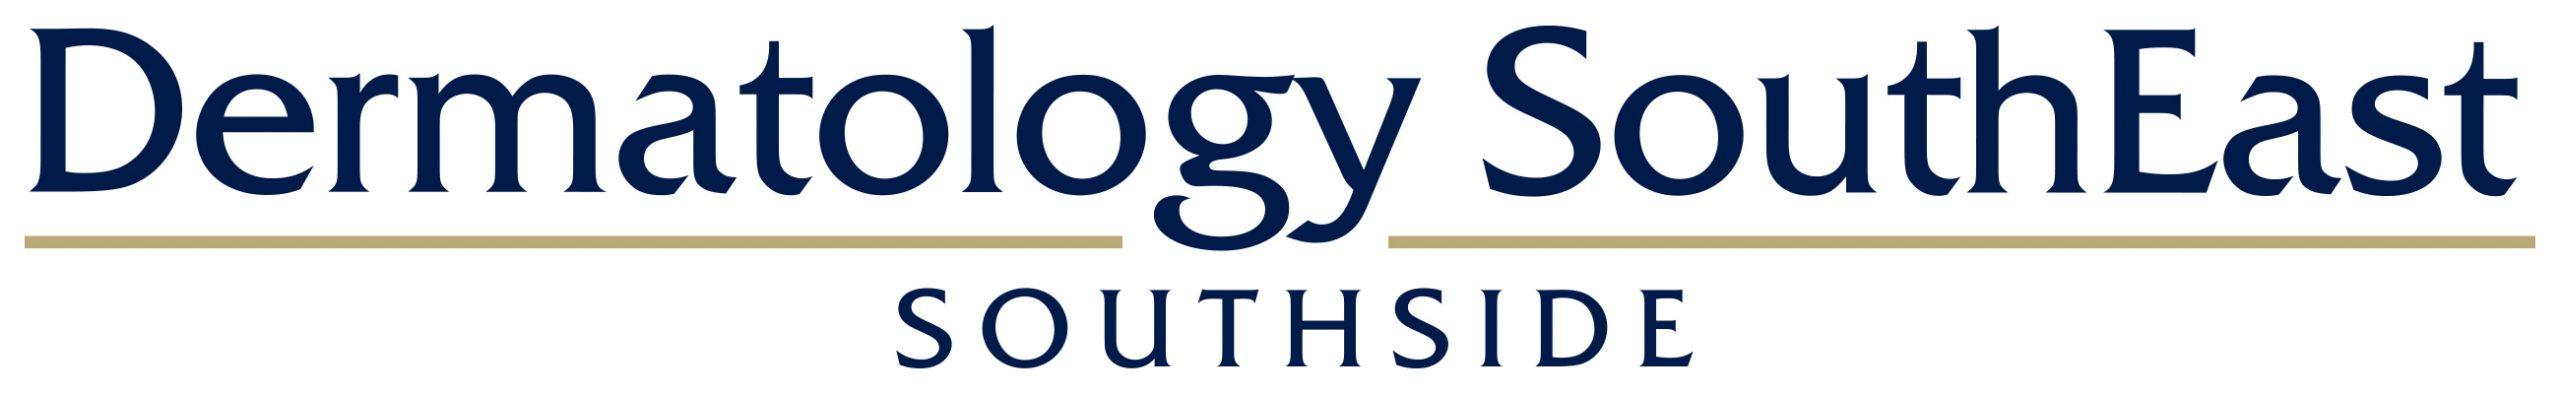 Jacksonville Dermatology Southeast